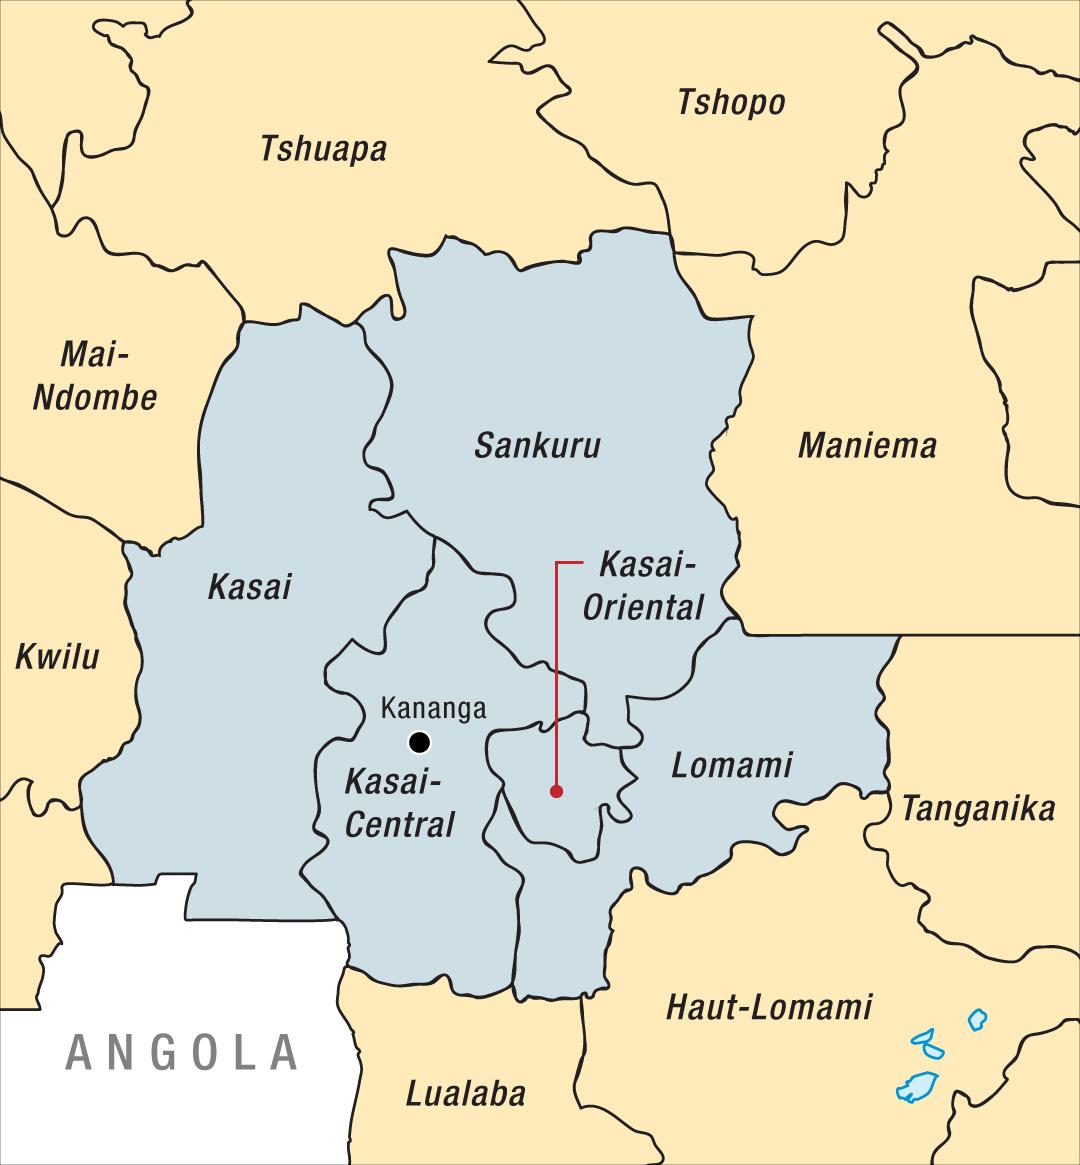 Humanitarian Crisis In Kasai Region Dr Congo Crise Humanitaire Dans